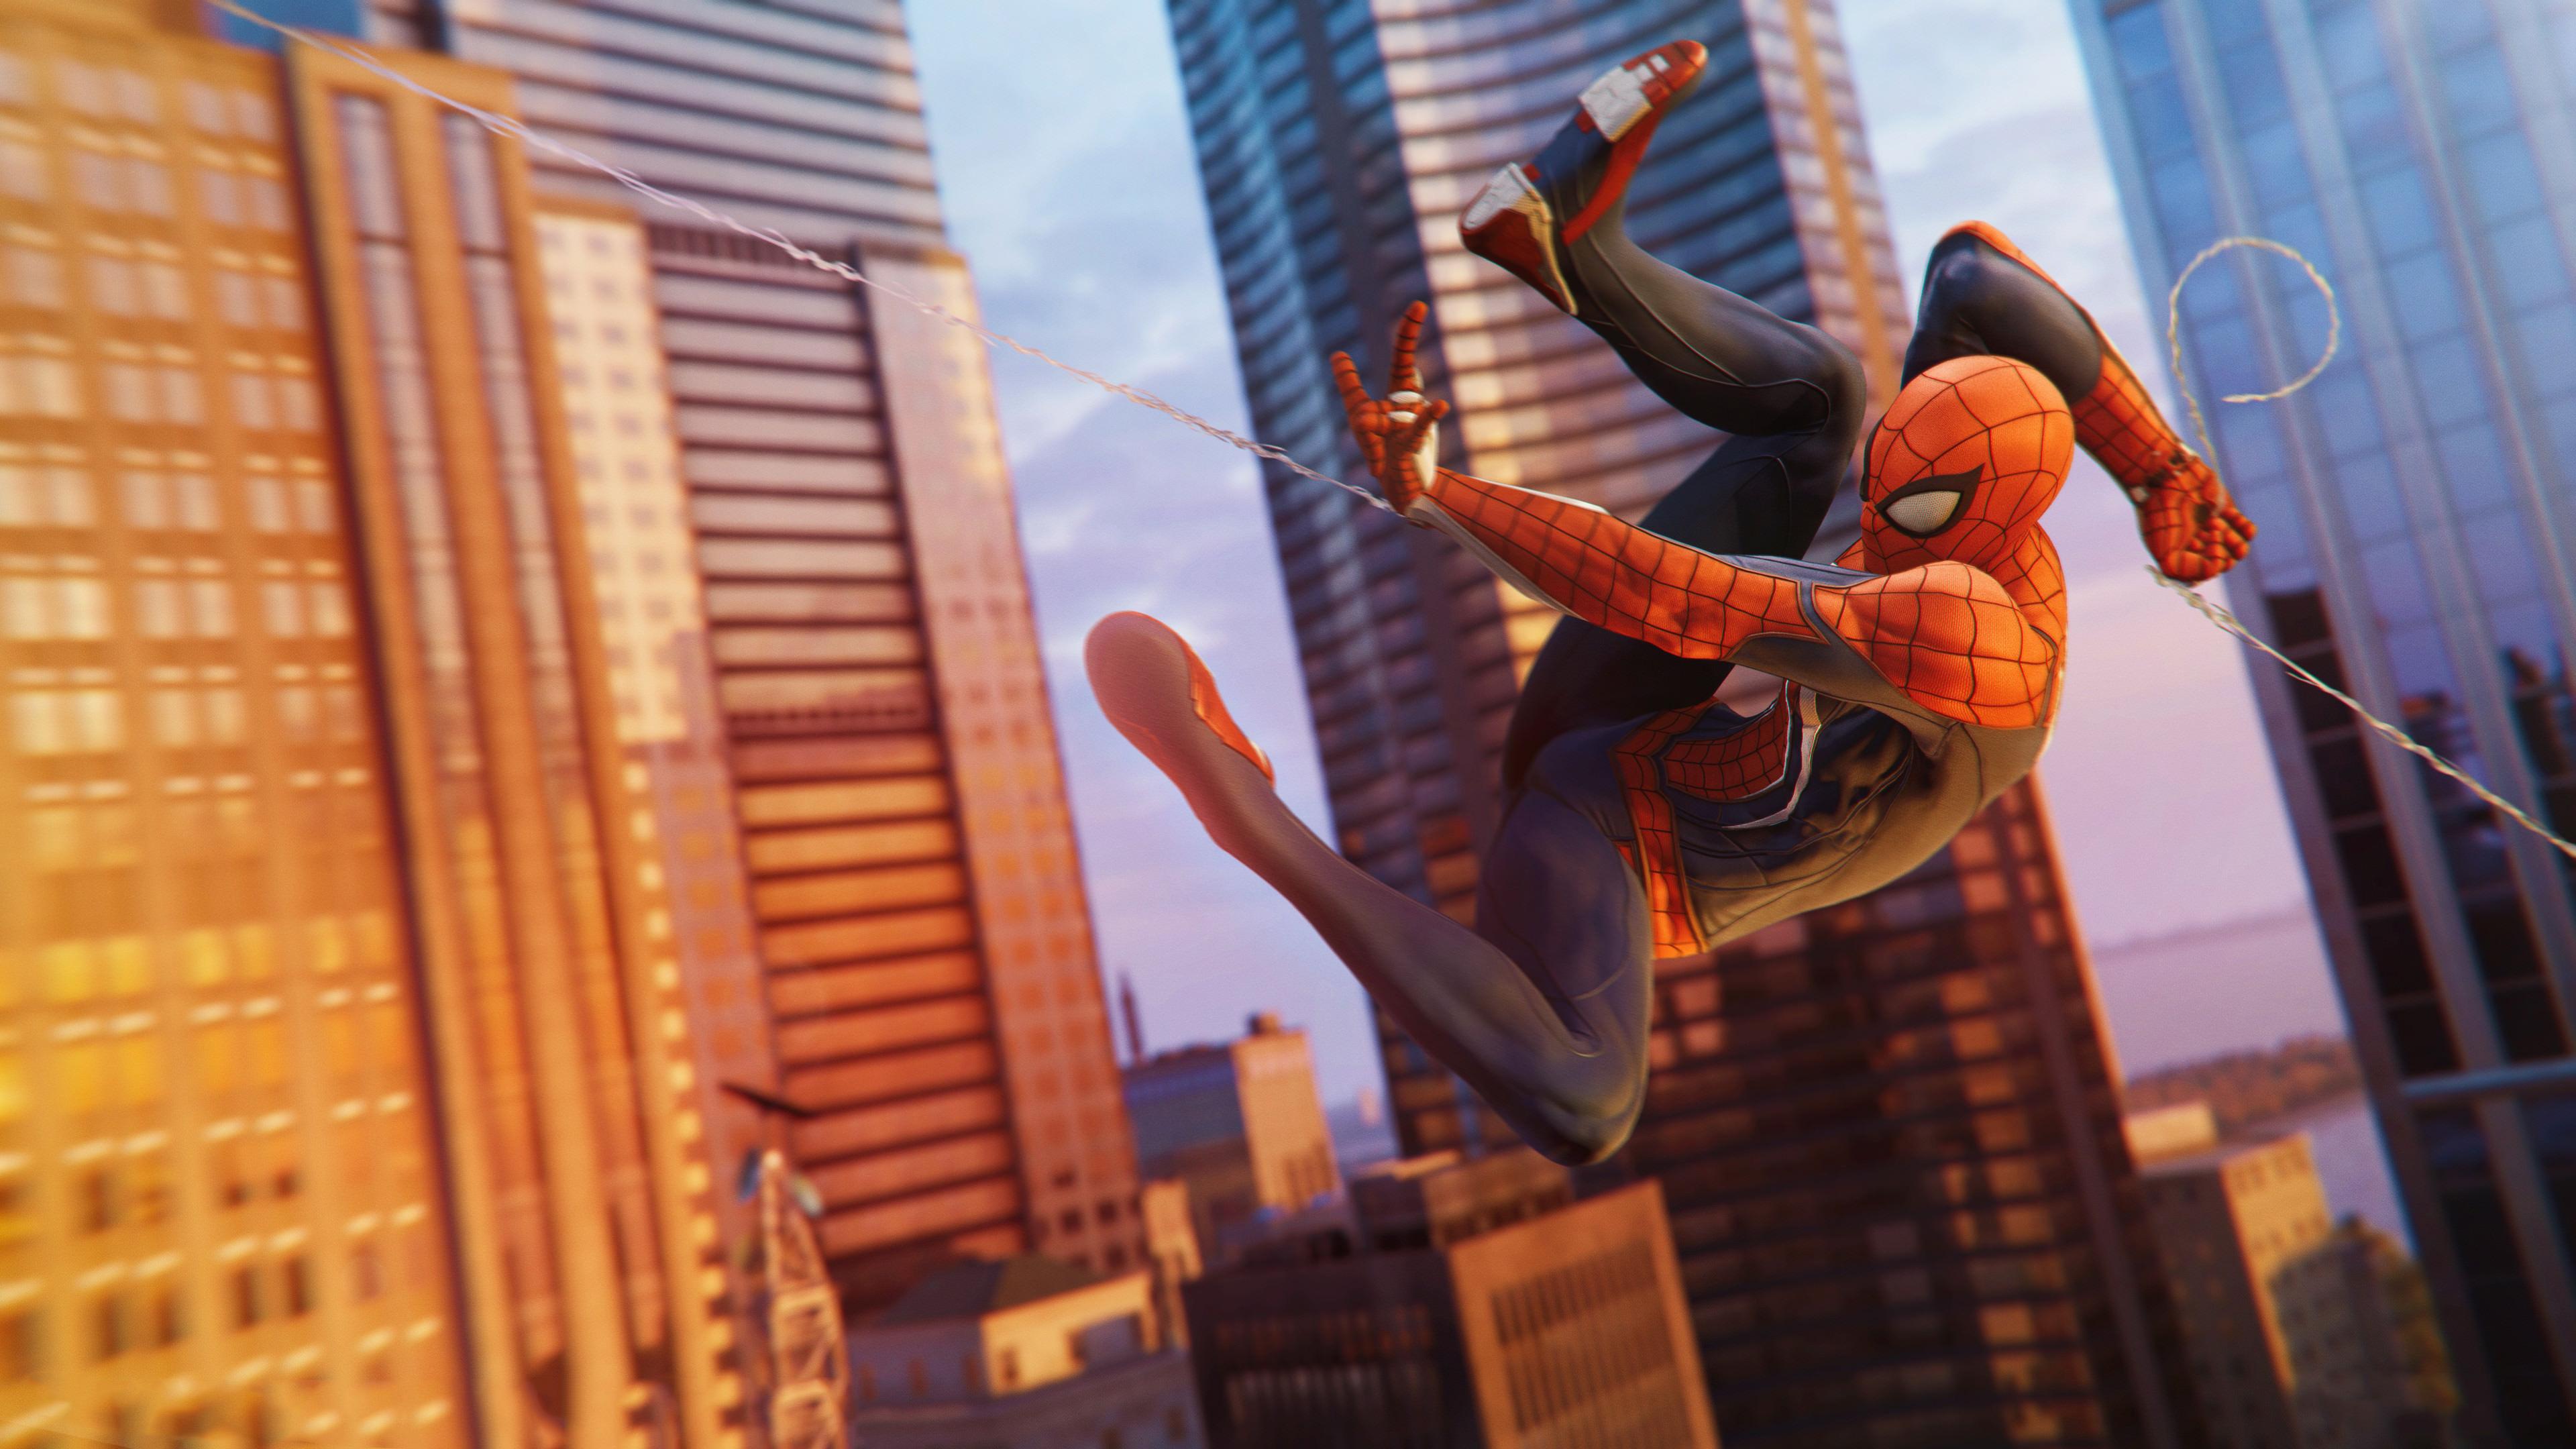 spiderman ps4 game 4k 2018 1537691402 - Spiderman Ps4 Game 4k 2018 - superheroes wallpapers, spiderman wallpapers, spiderman ps4 wallpapers, ps games wallpapers, hd-wallpapers, games wallpapers, 4k-wallpapers, 2018 games wallpapers